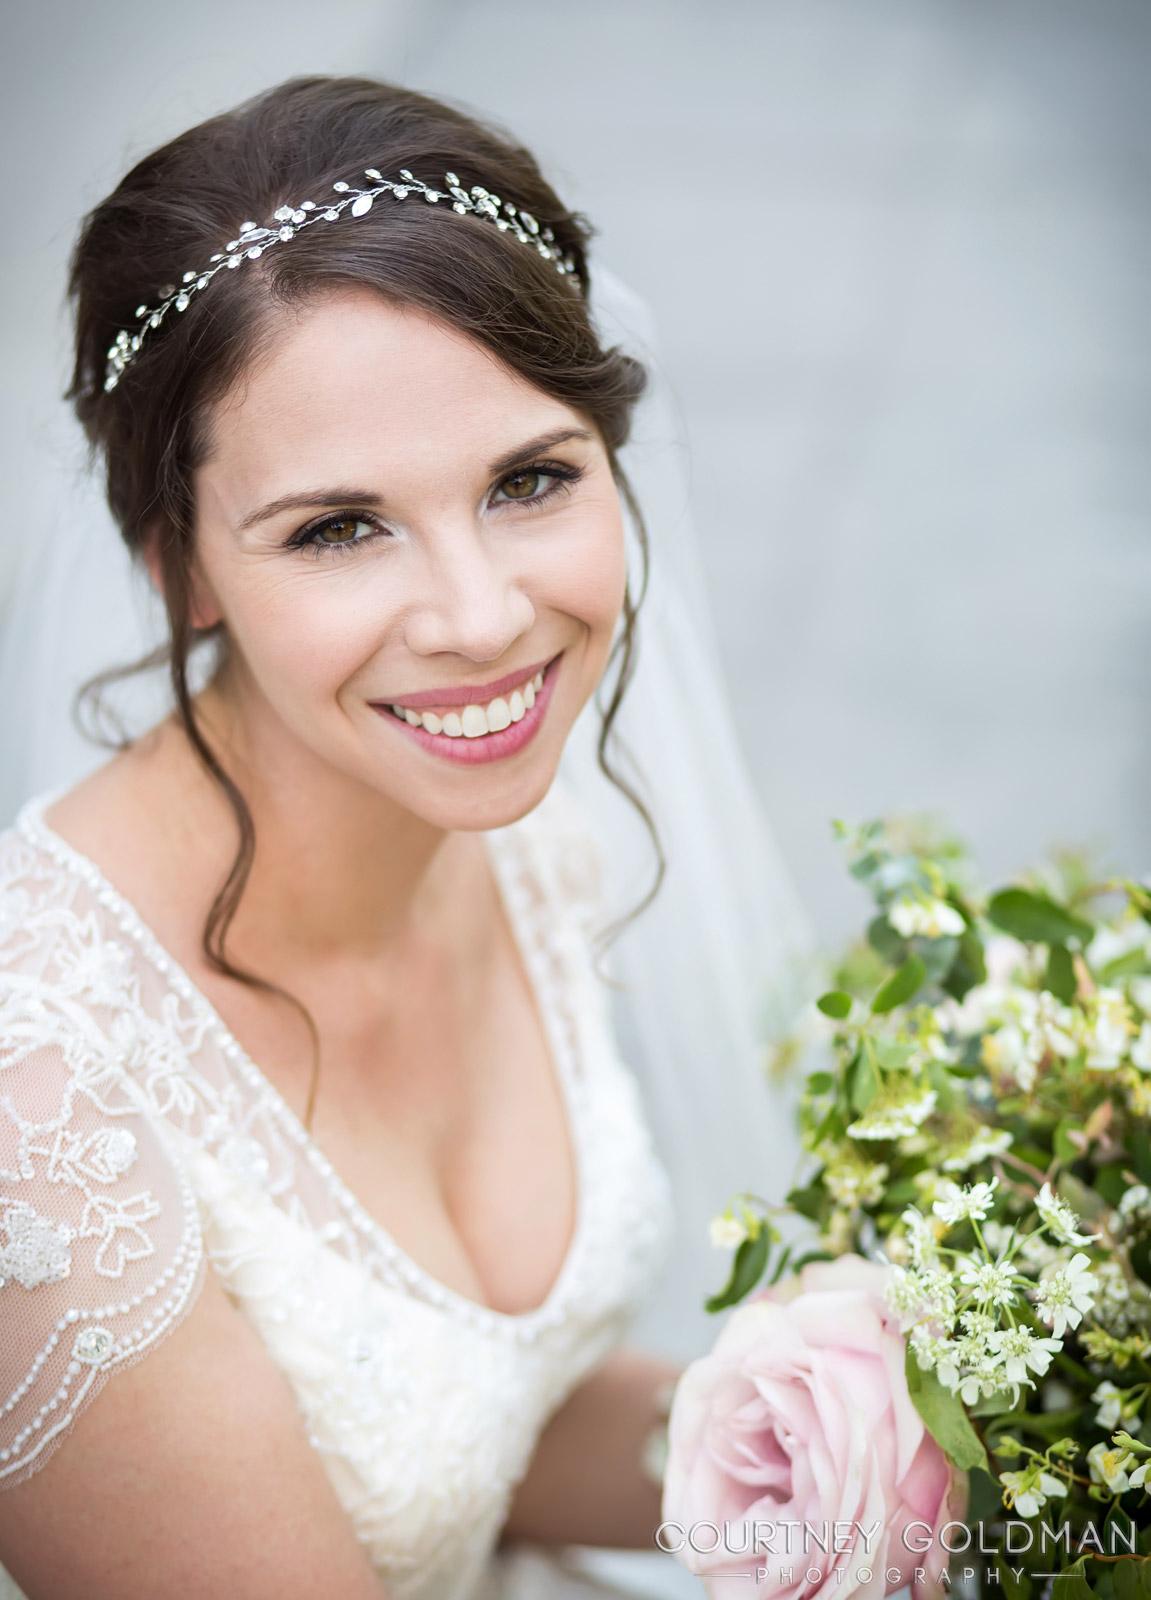 Atlanta-Wedding-Photography-by-Courtney-Goldman-48.jpg